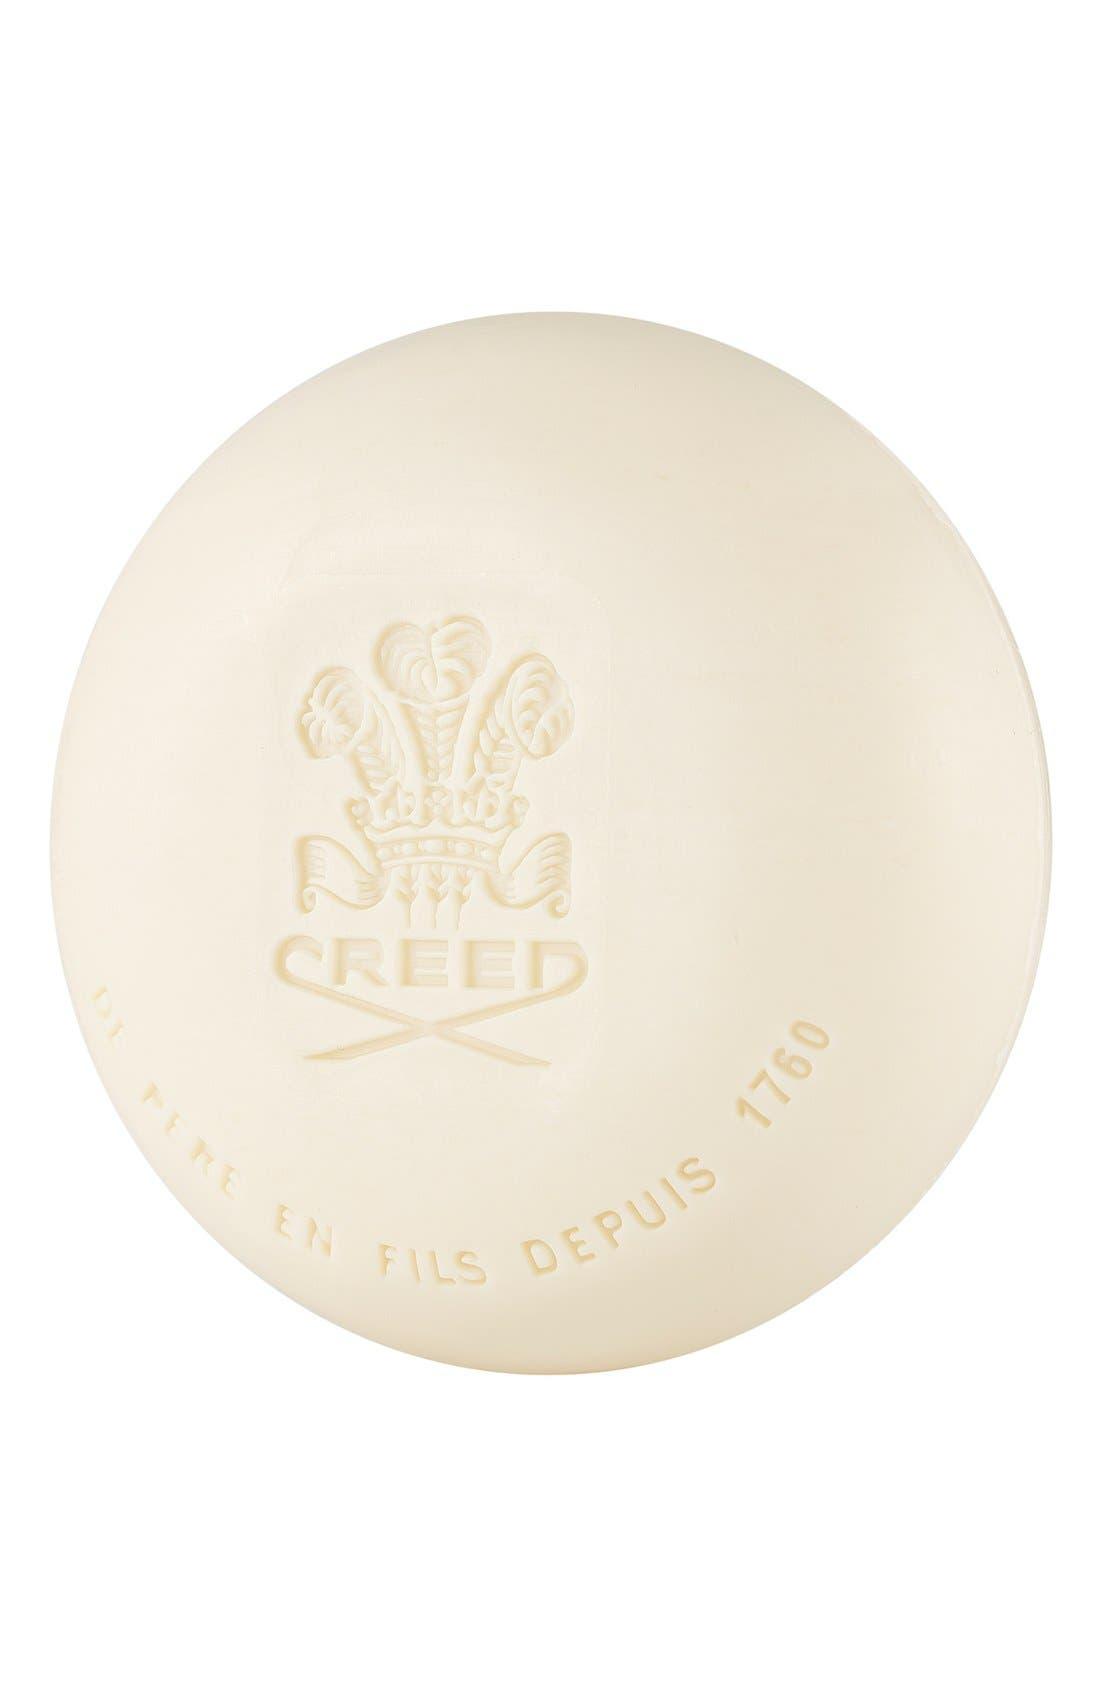 Creed 'Original Vetiver' Soap